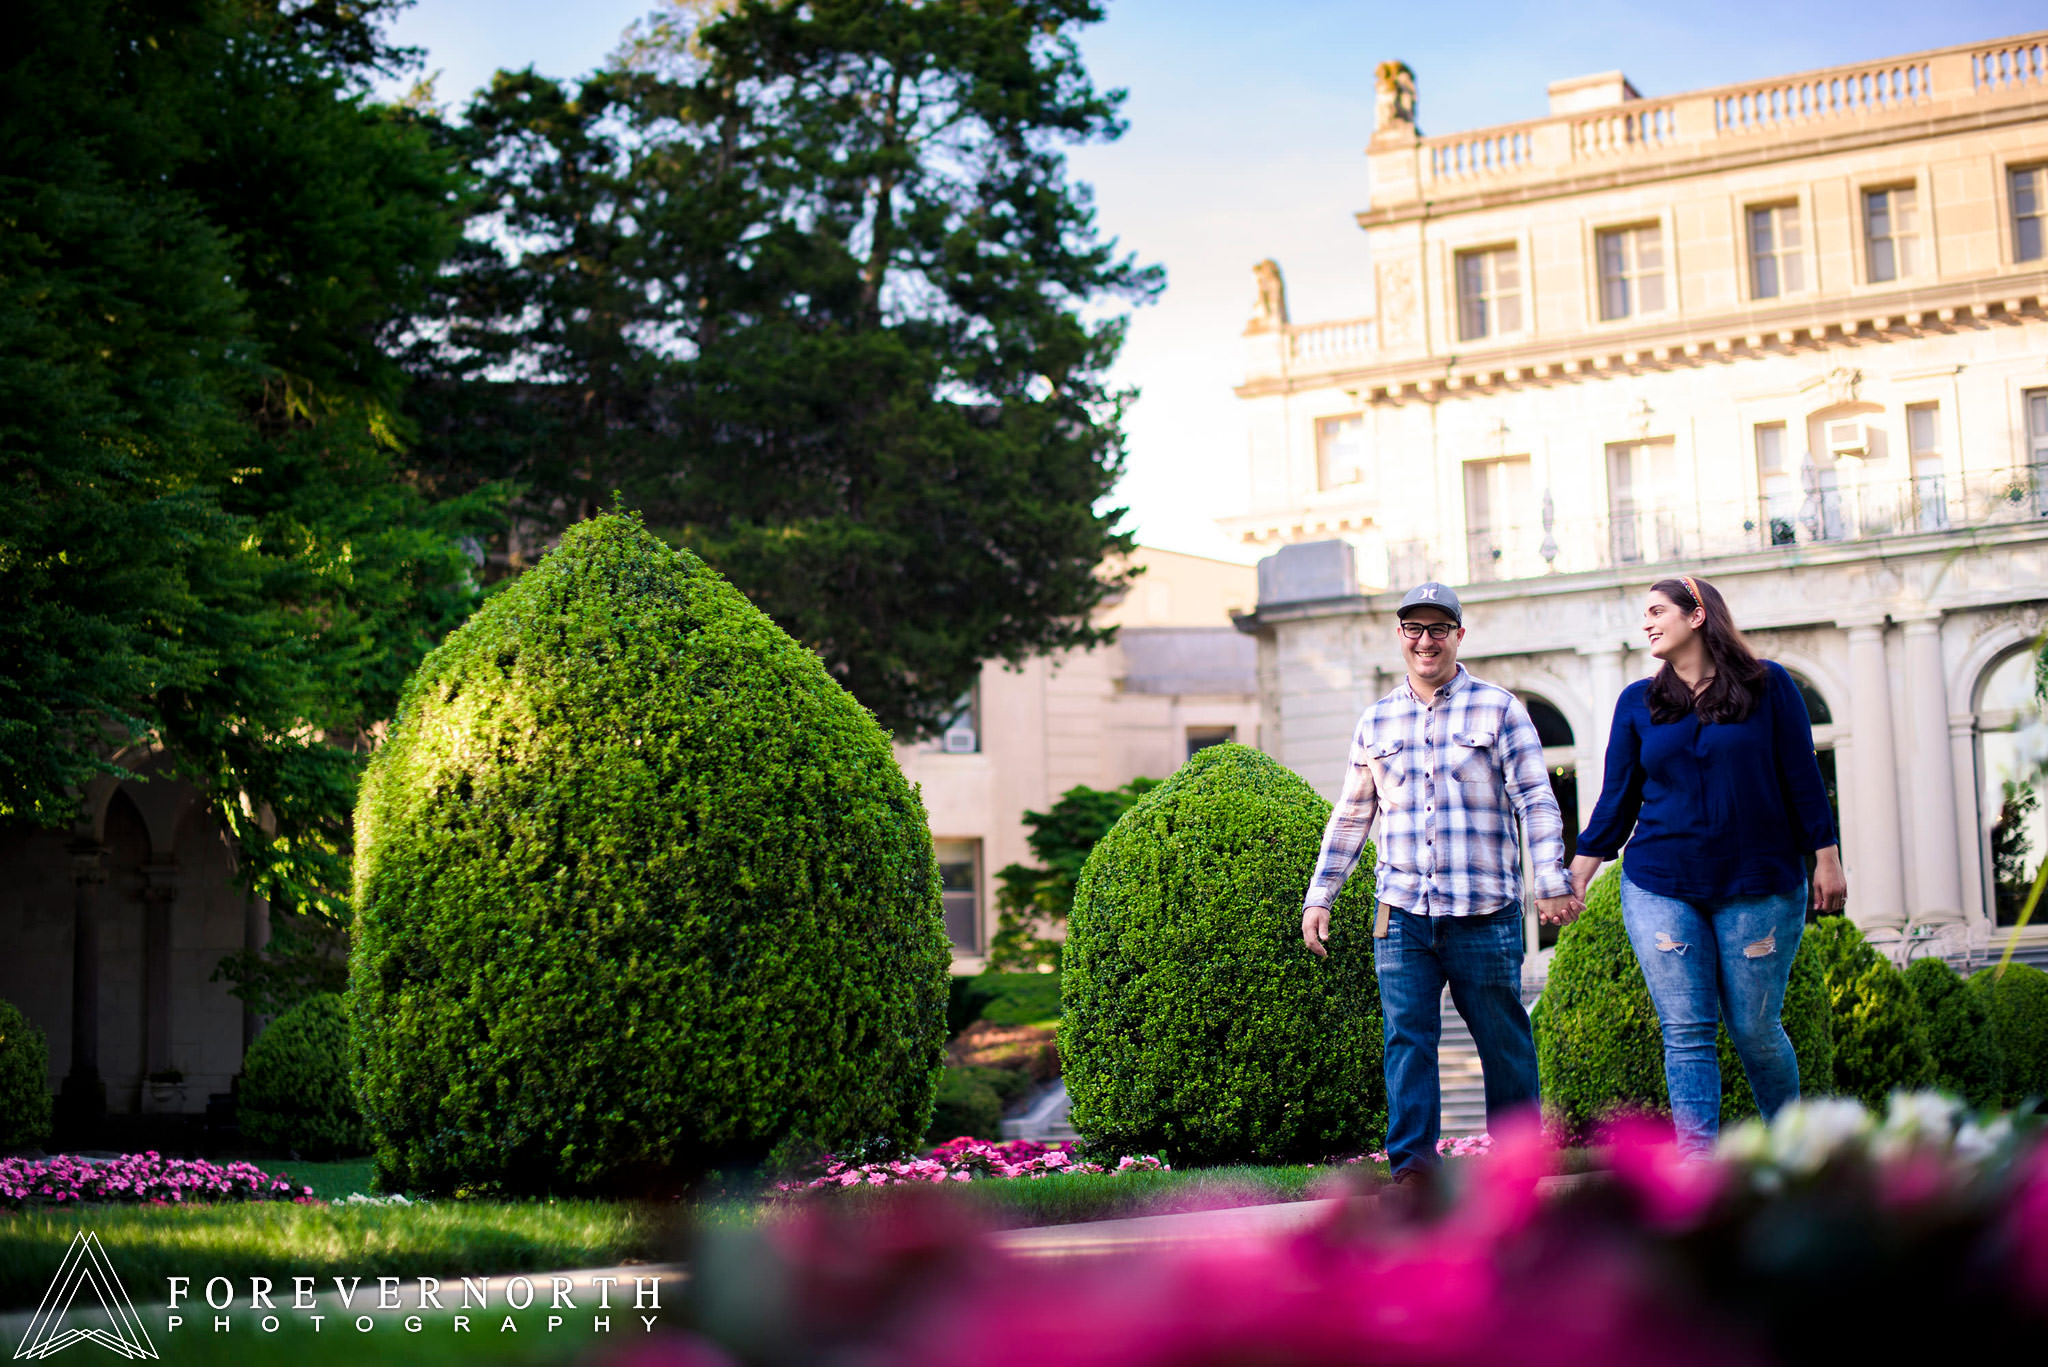 Brown-Monmouth-Gardens-Engagement-Photos05.JPG